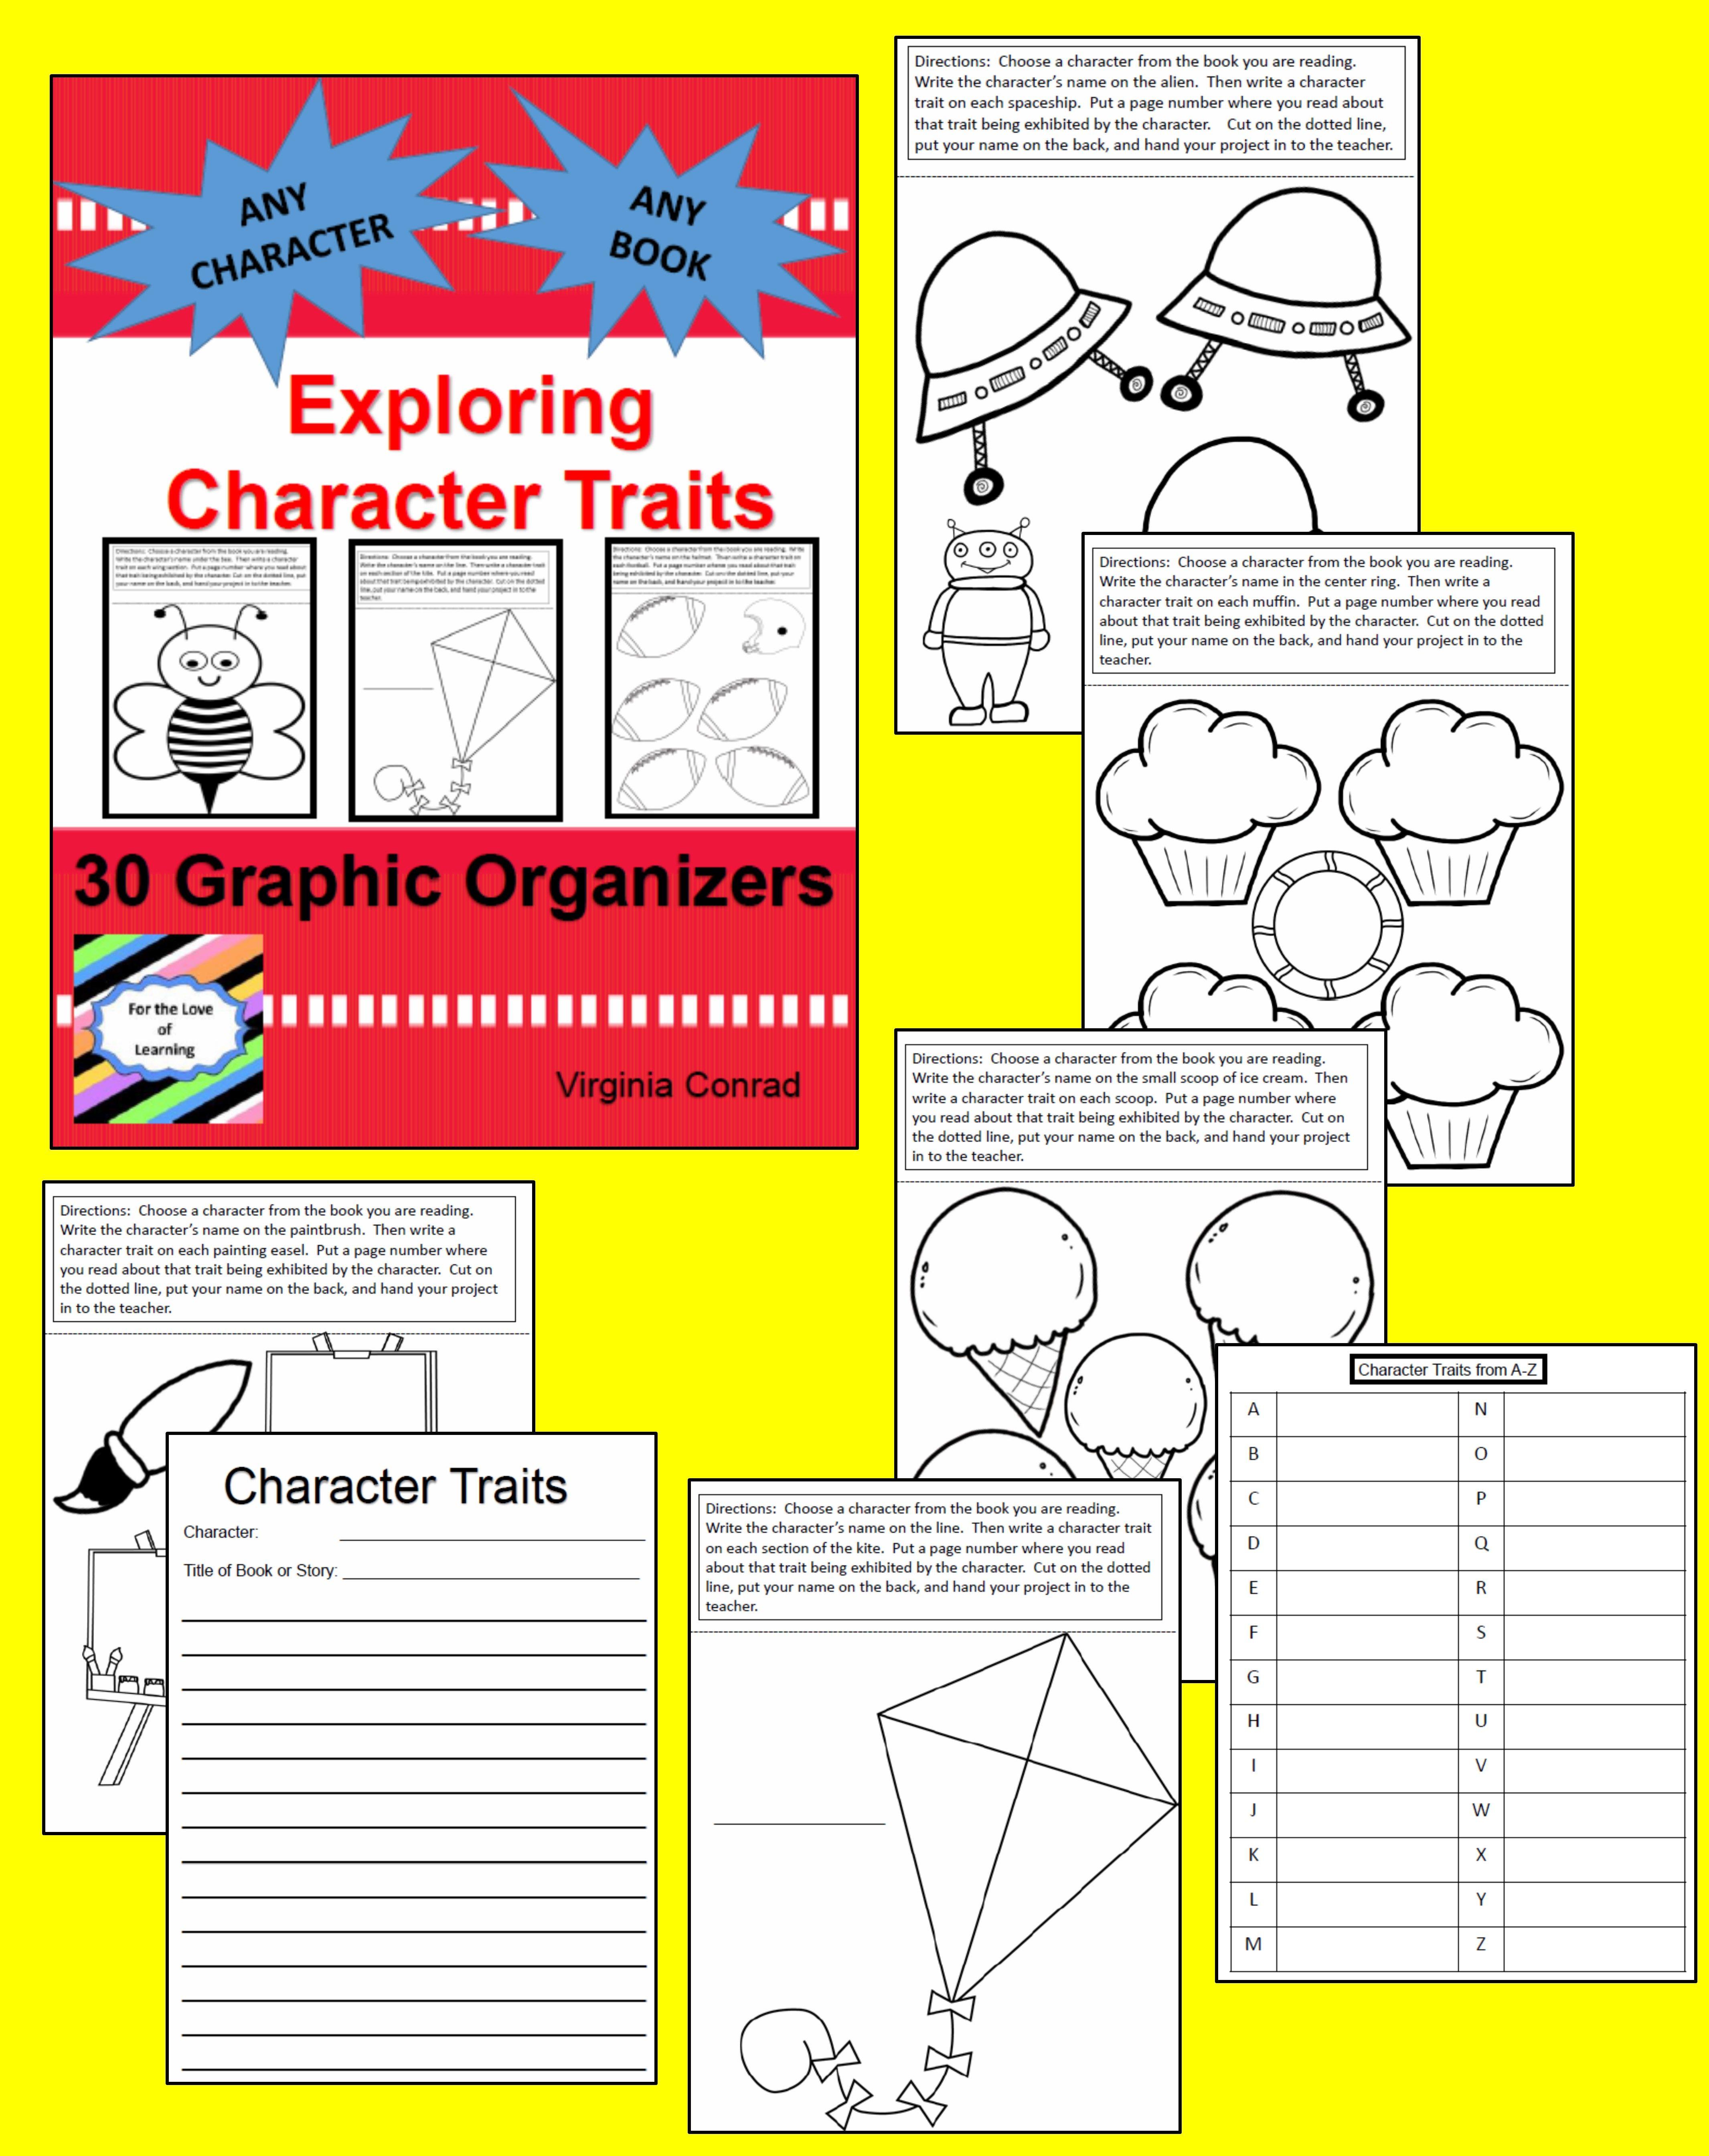 Character Traits 30 Graphic Organizers